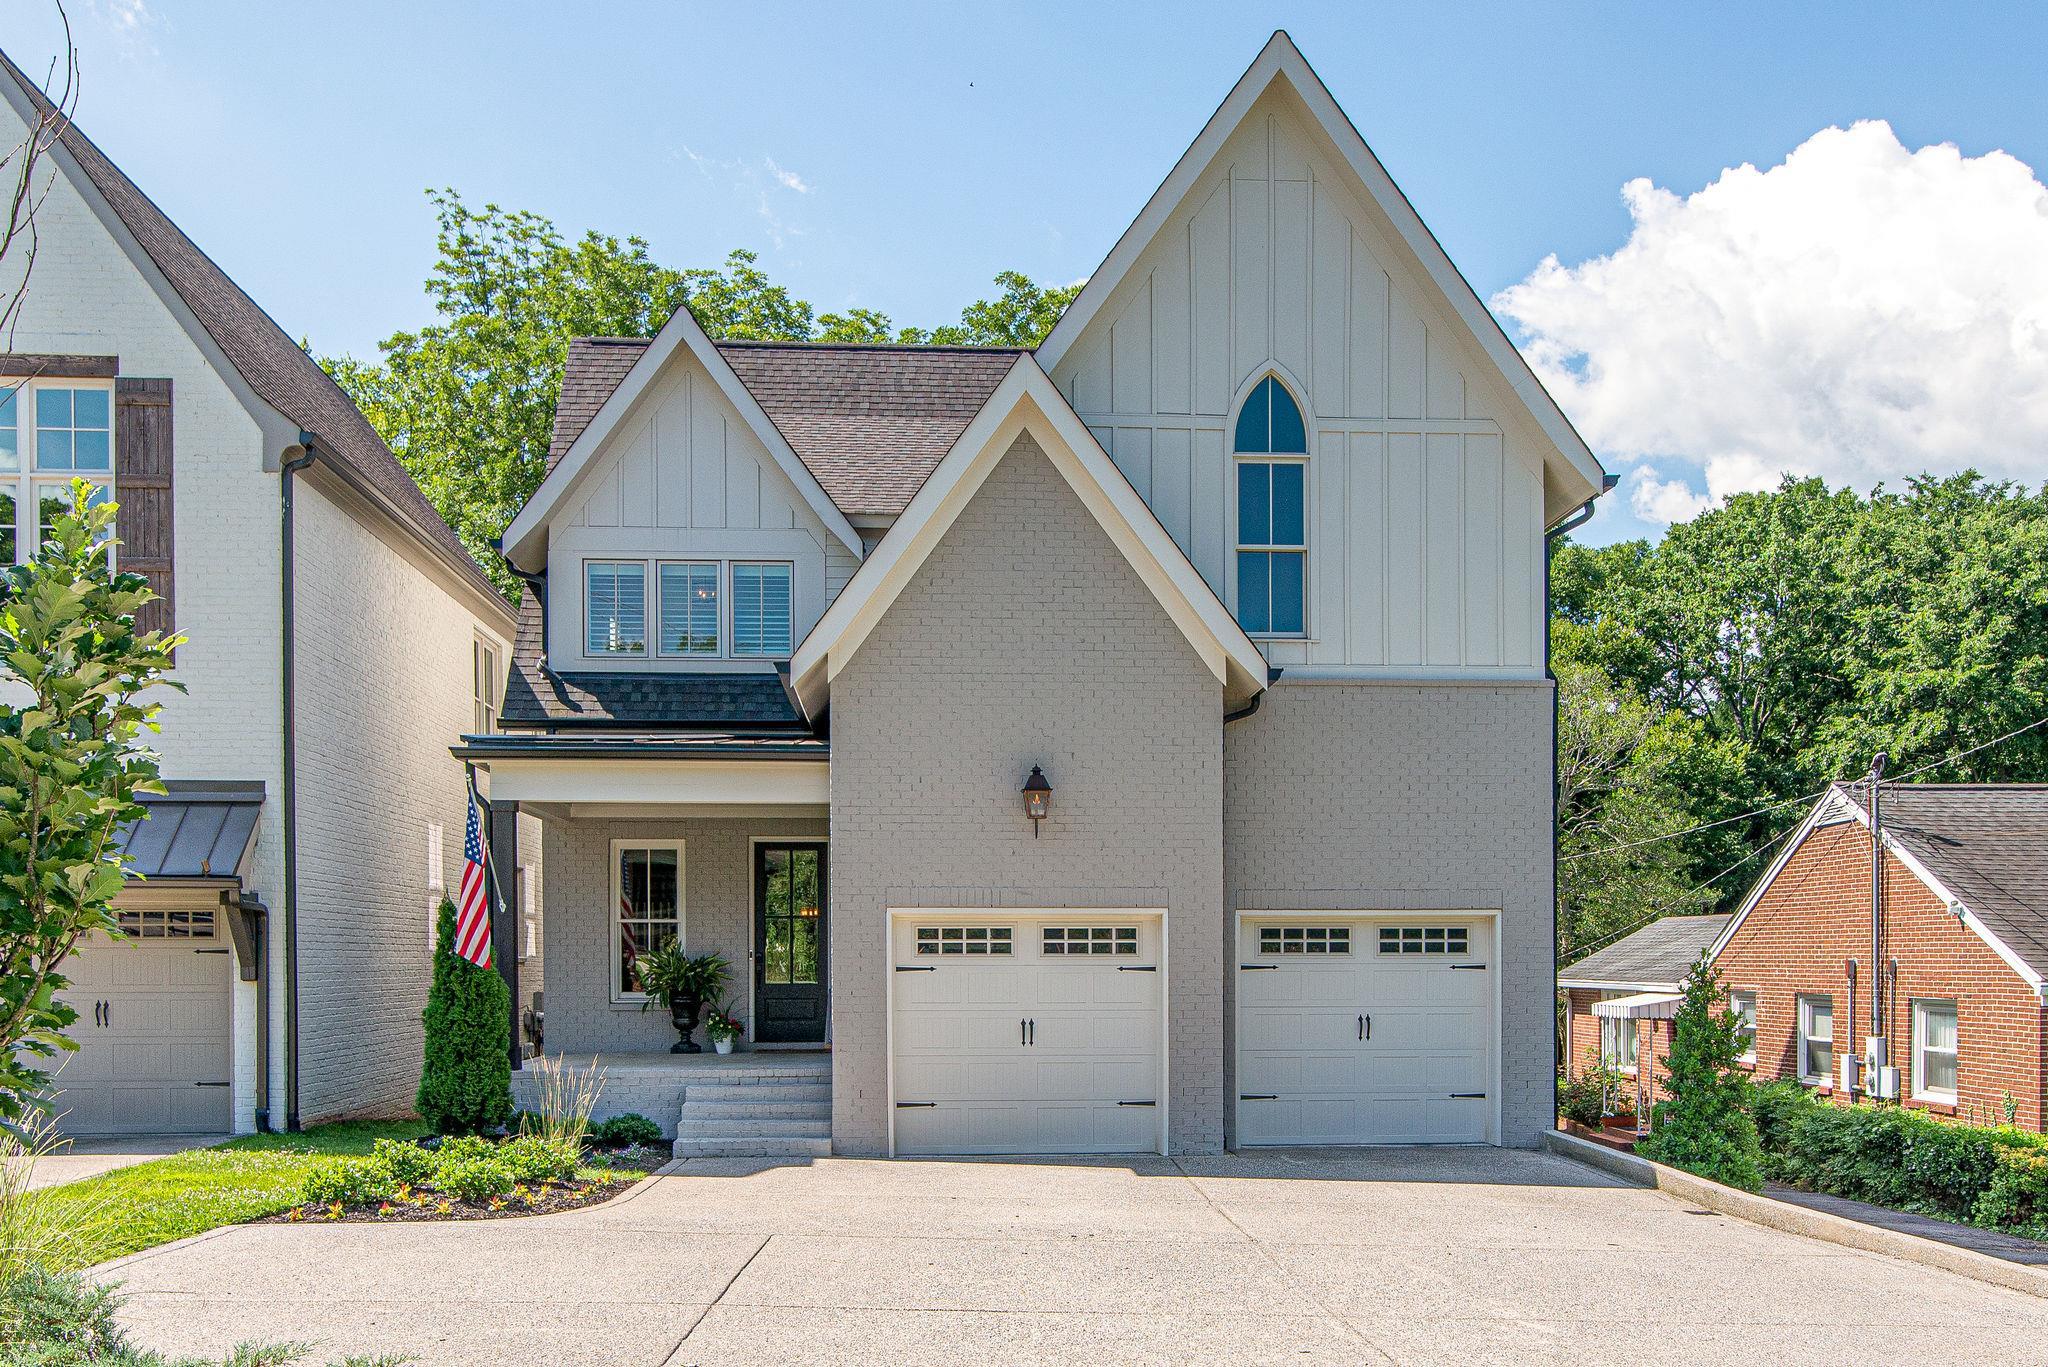 927B Kirkwood Ave, Nashville, TN 37204 - Nashville, TN real estate listing